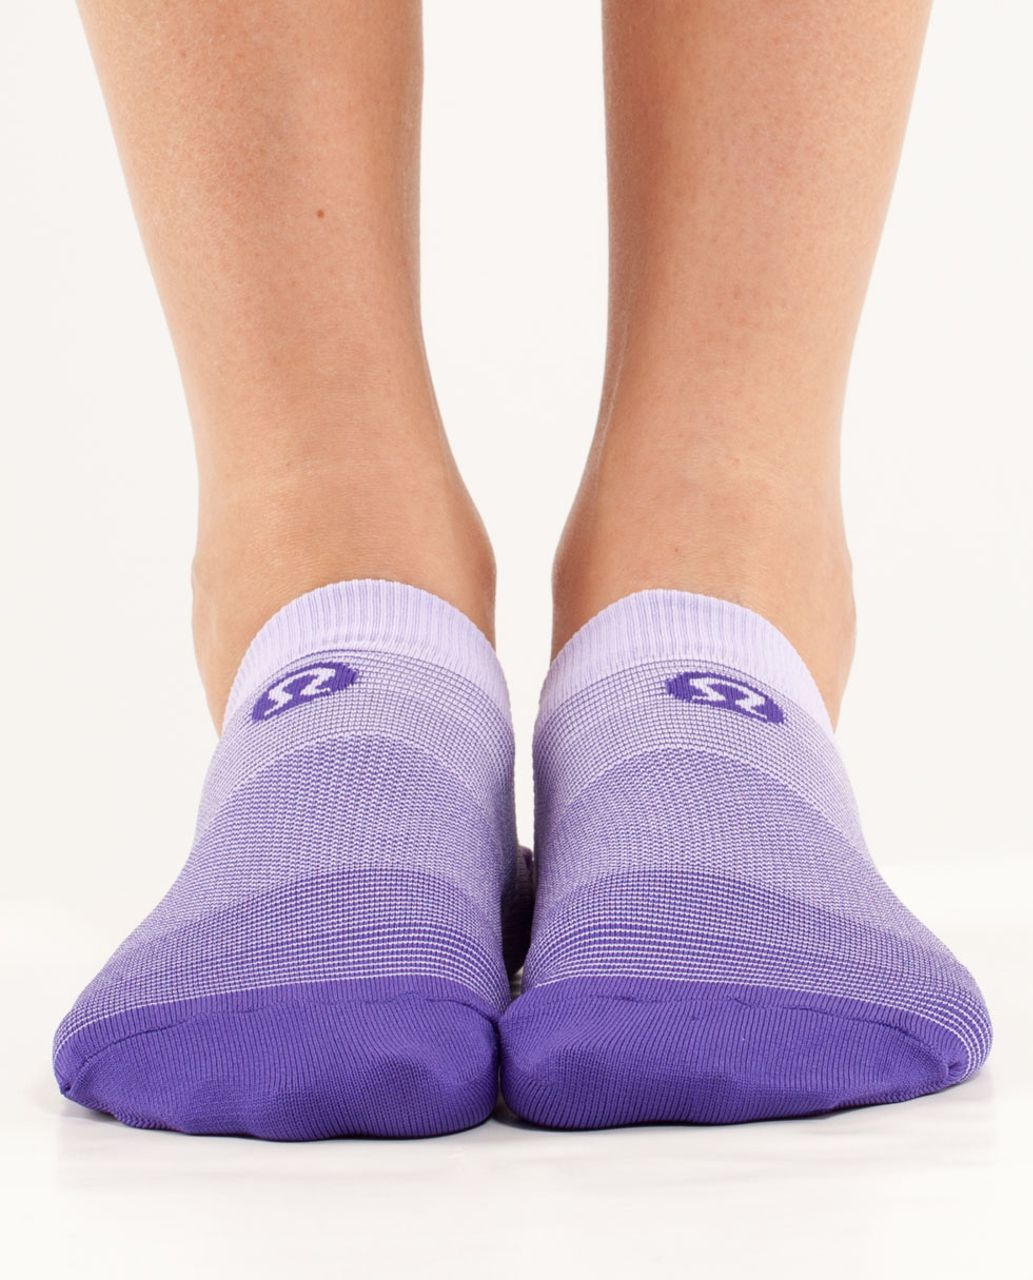 Lululemon Women's Featherweight Sock - Bruised Berry Lilac Gradient